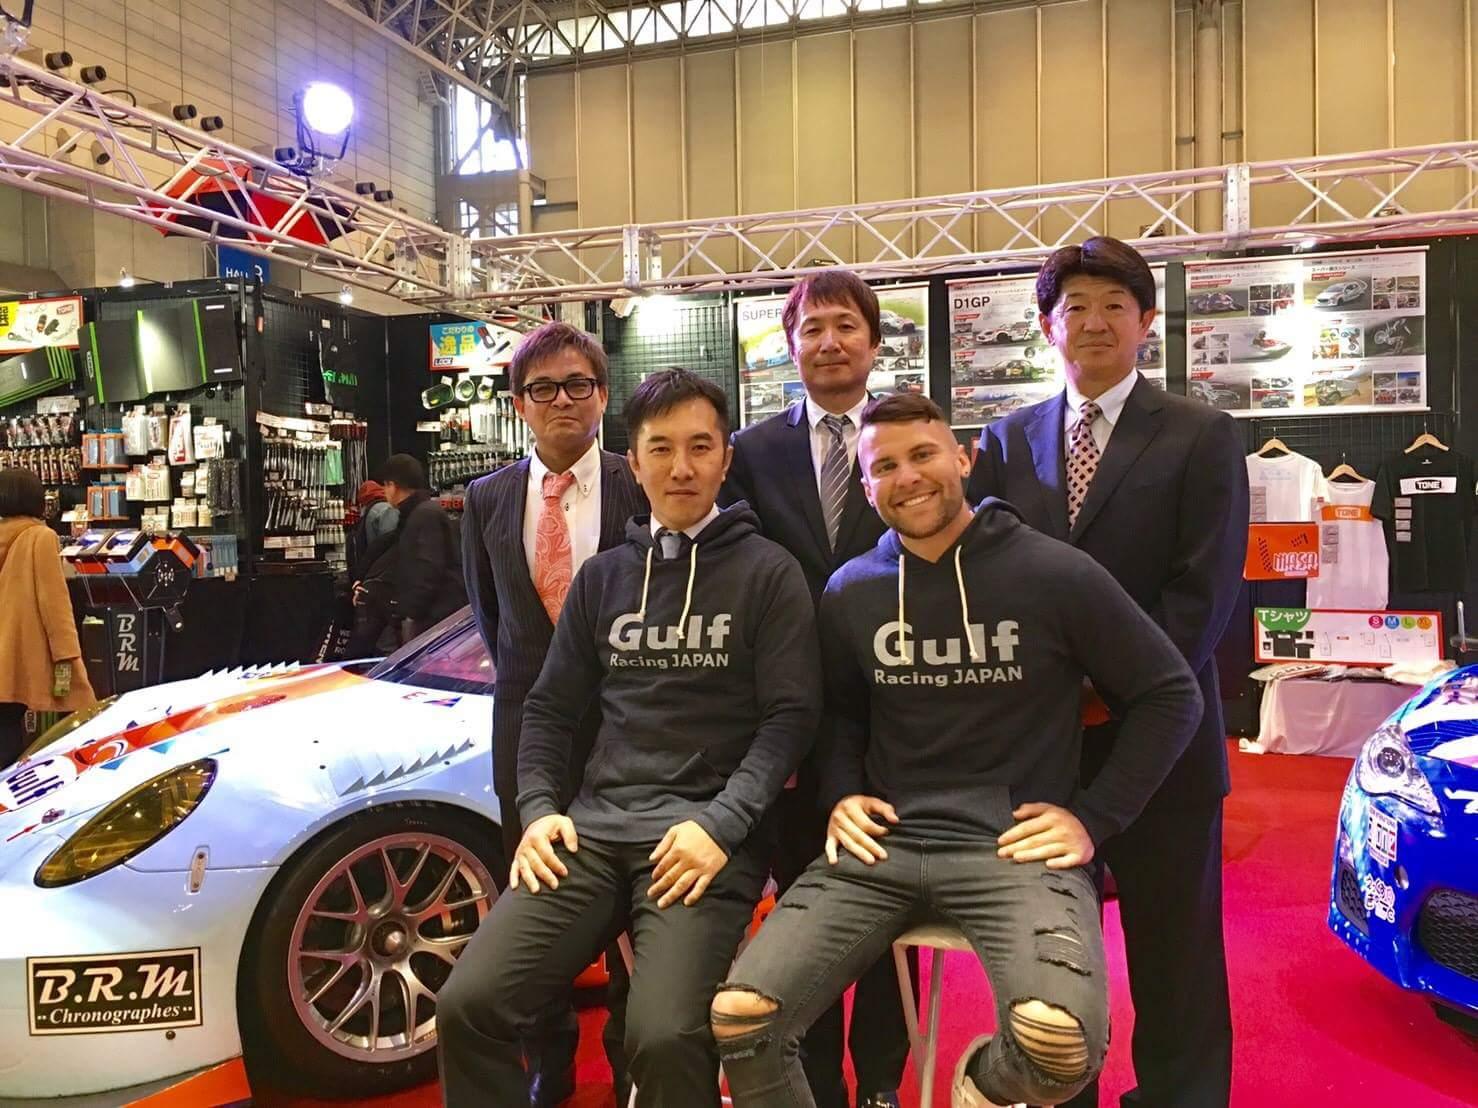 Jono Lester with Gulf Racing Japan at the 2017 Tokyo Auto Salon